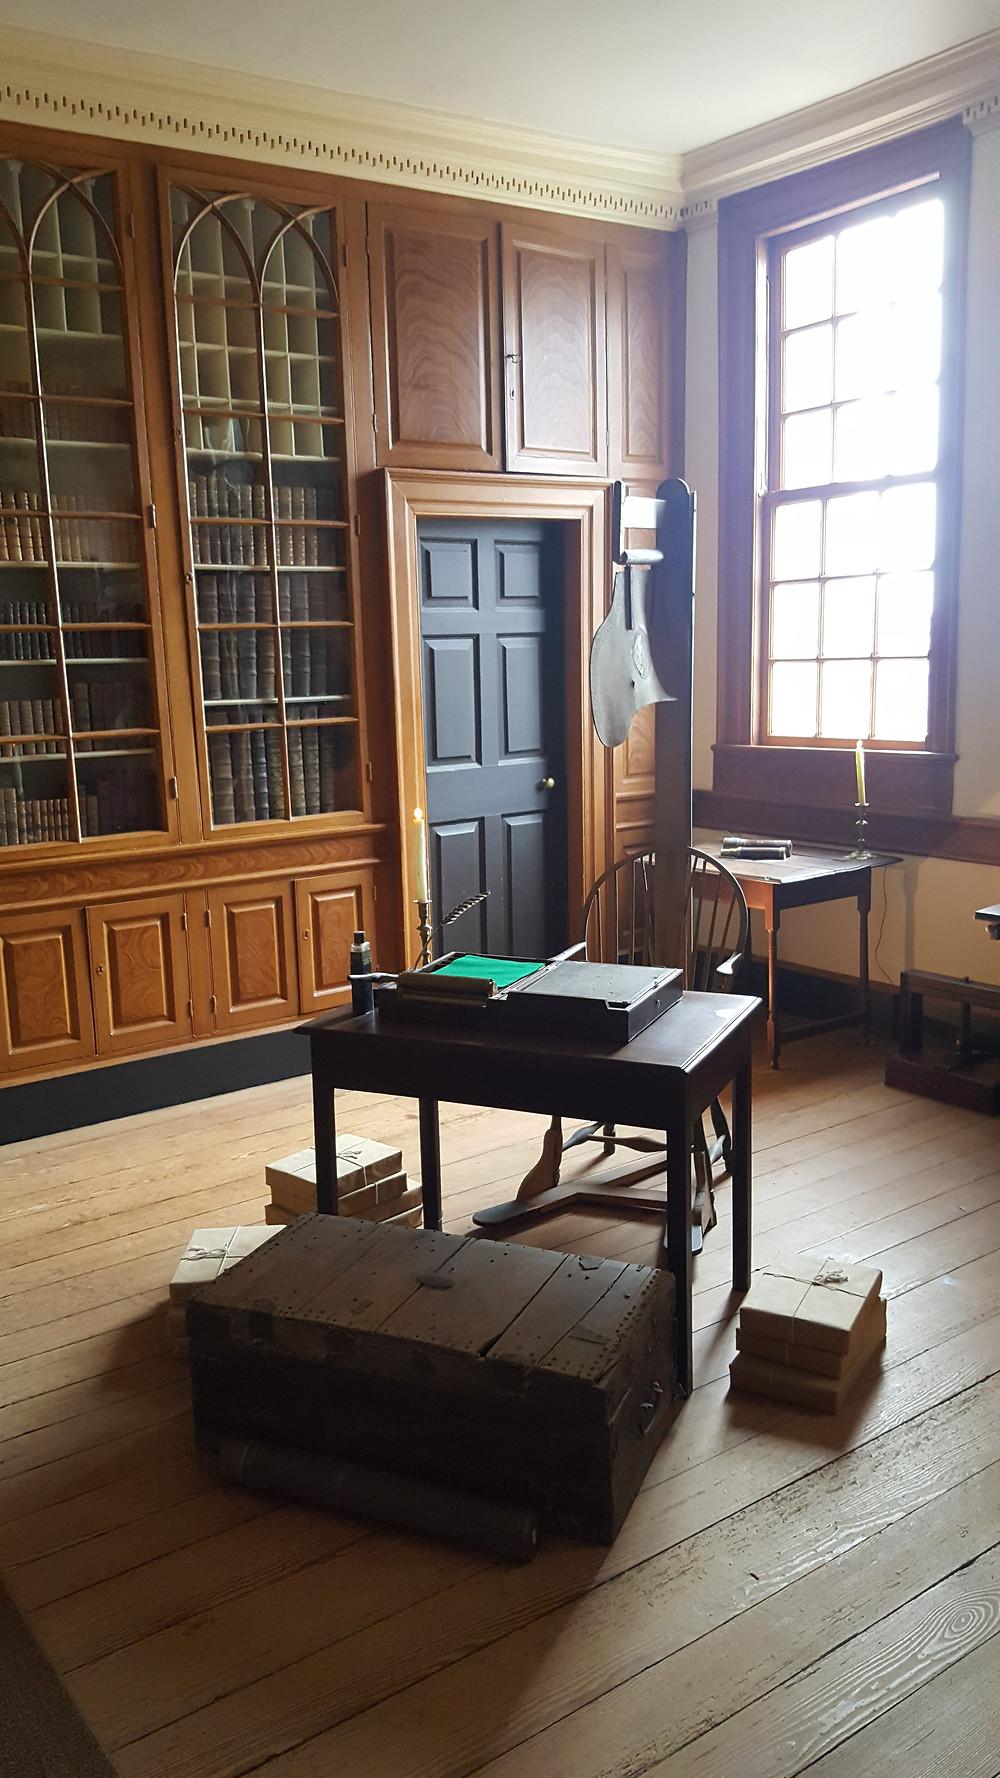 Washington's study